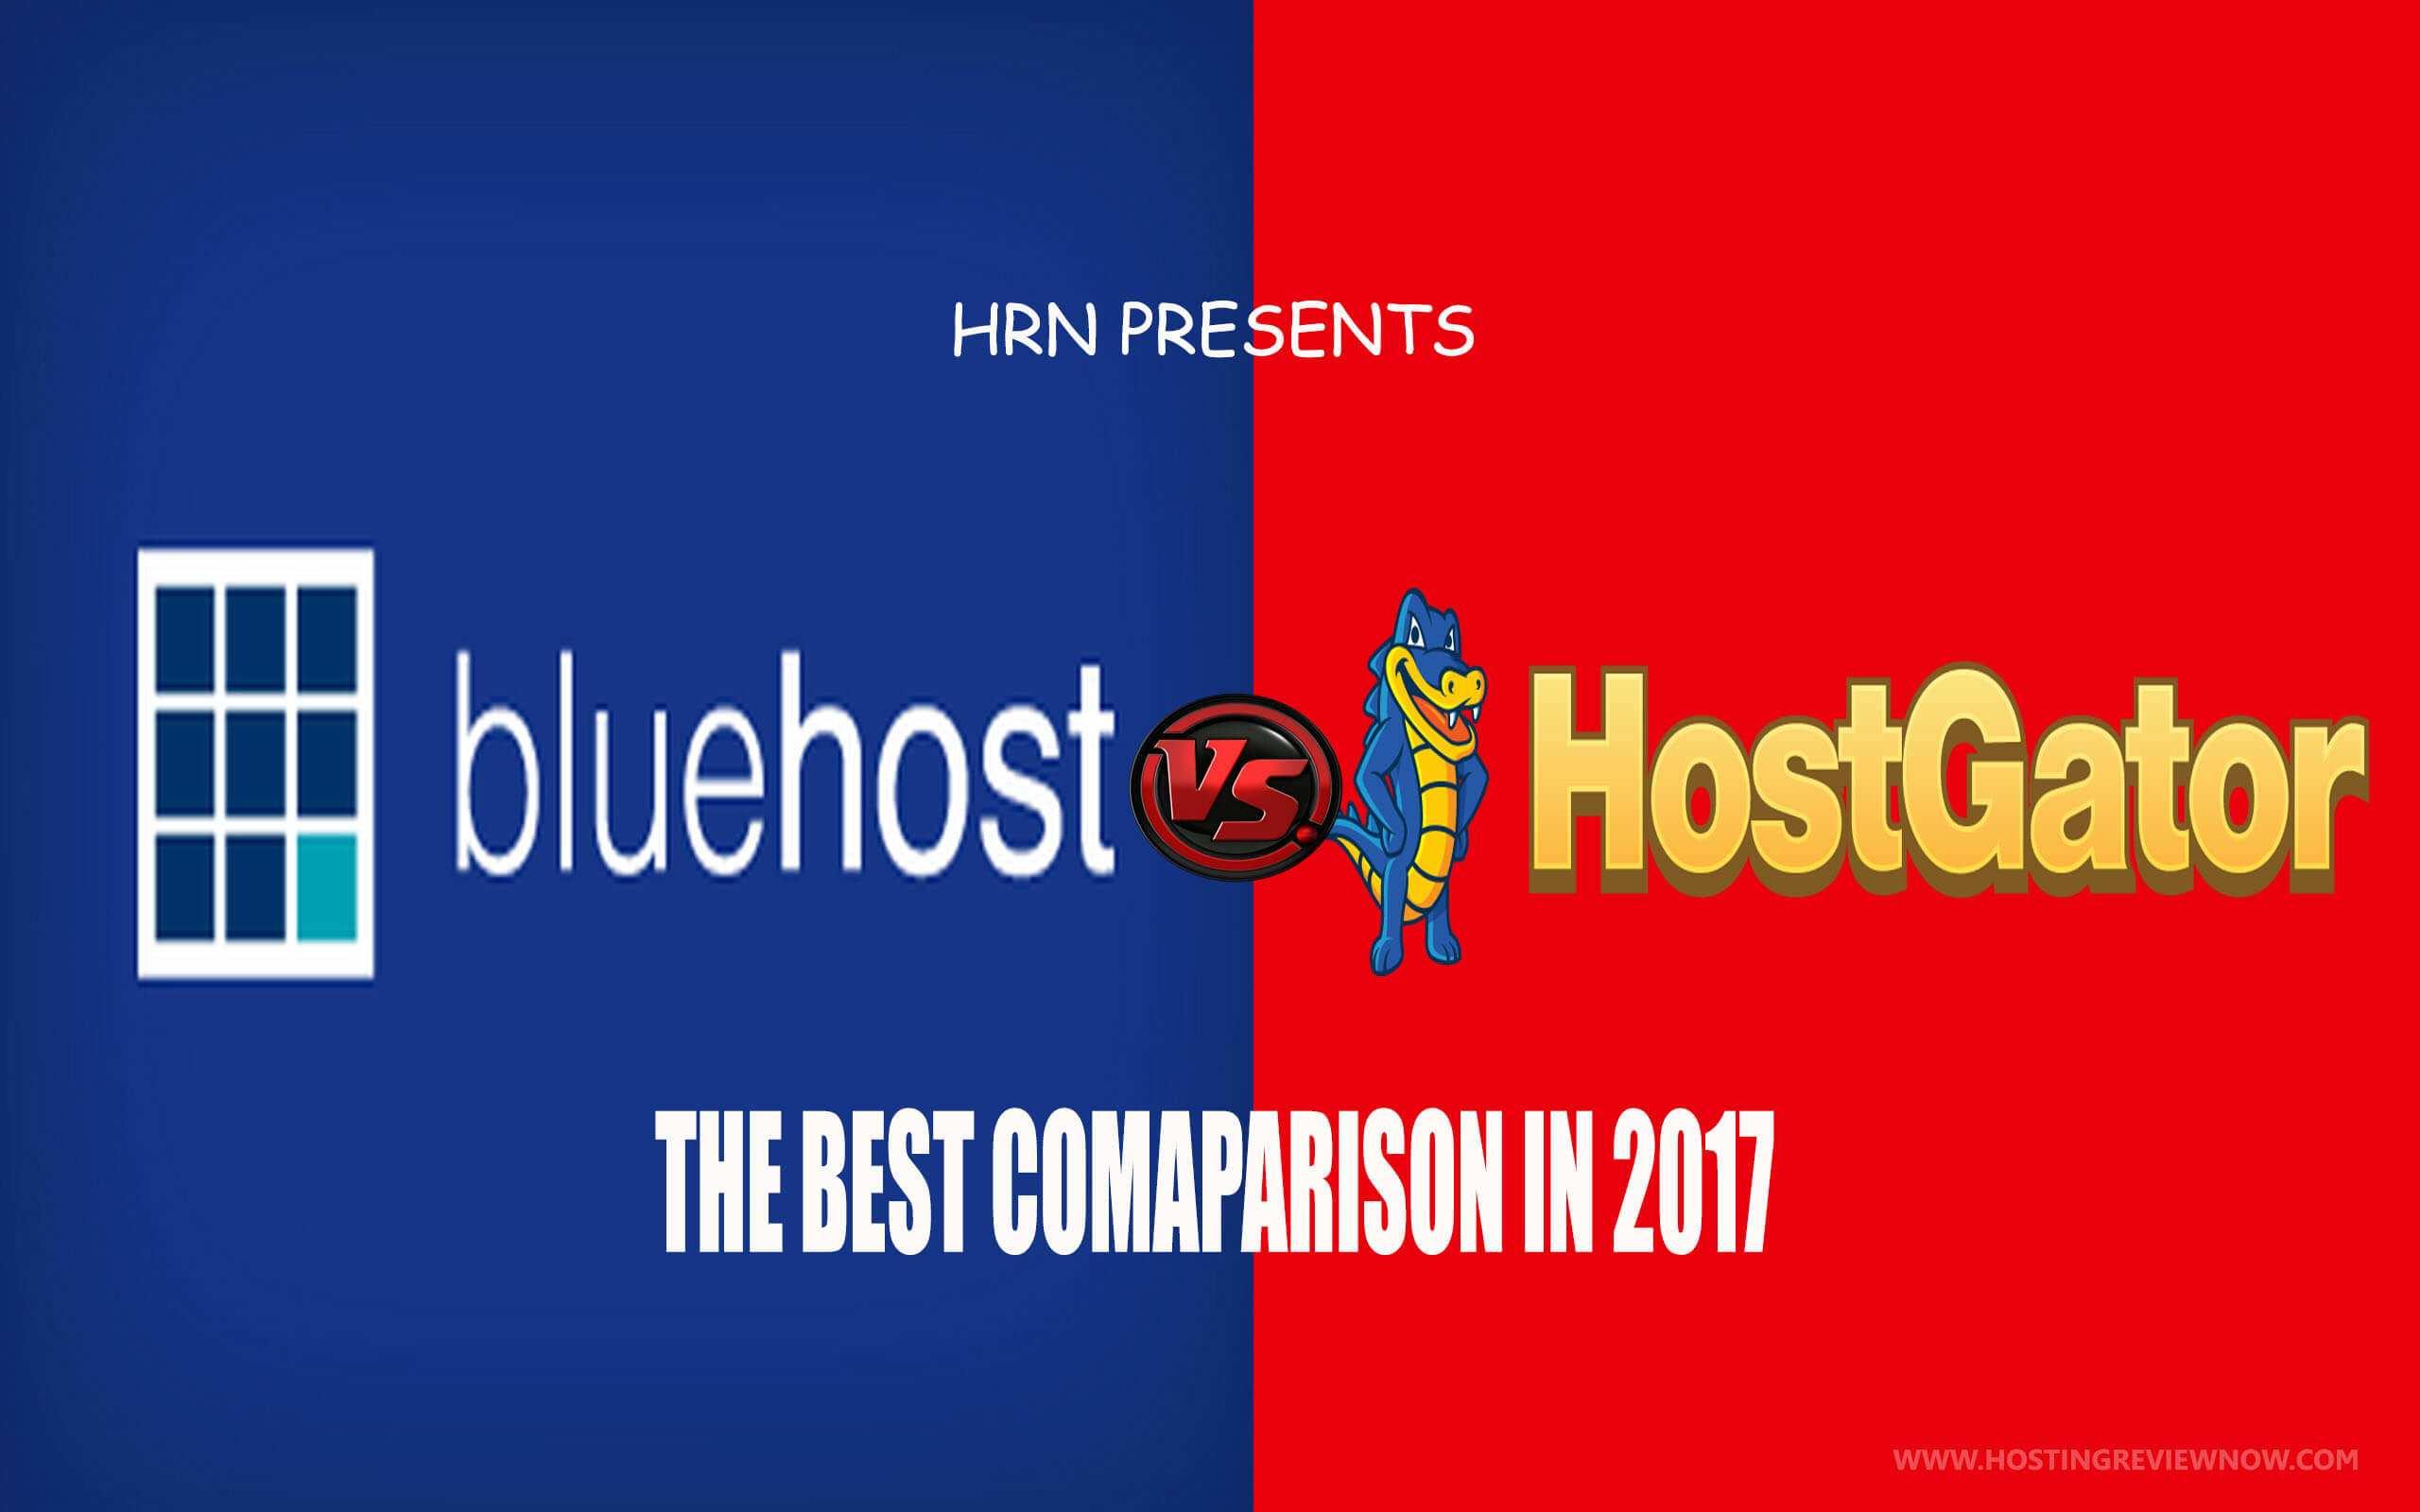 bluehost vs hostgator 2017